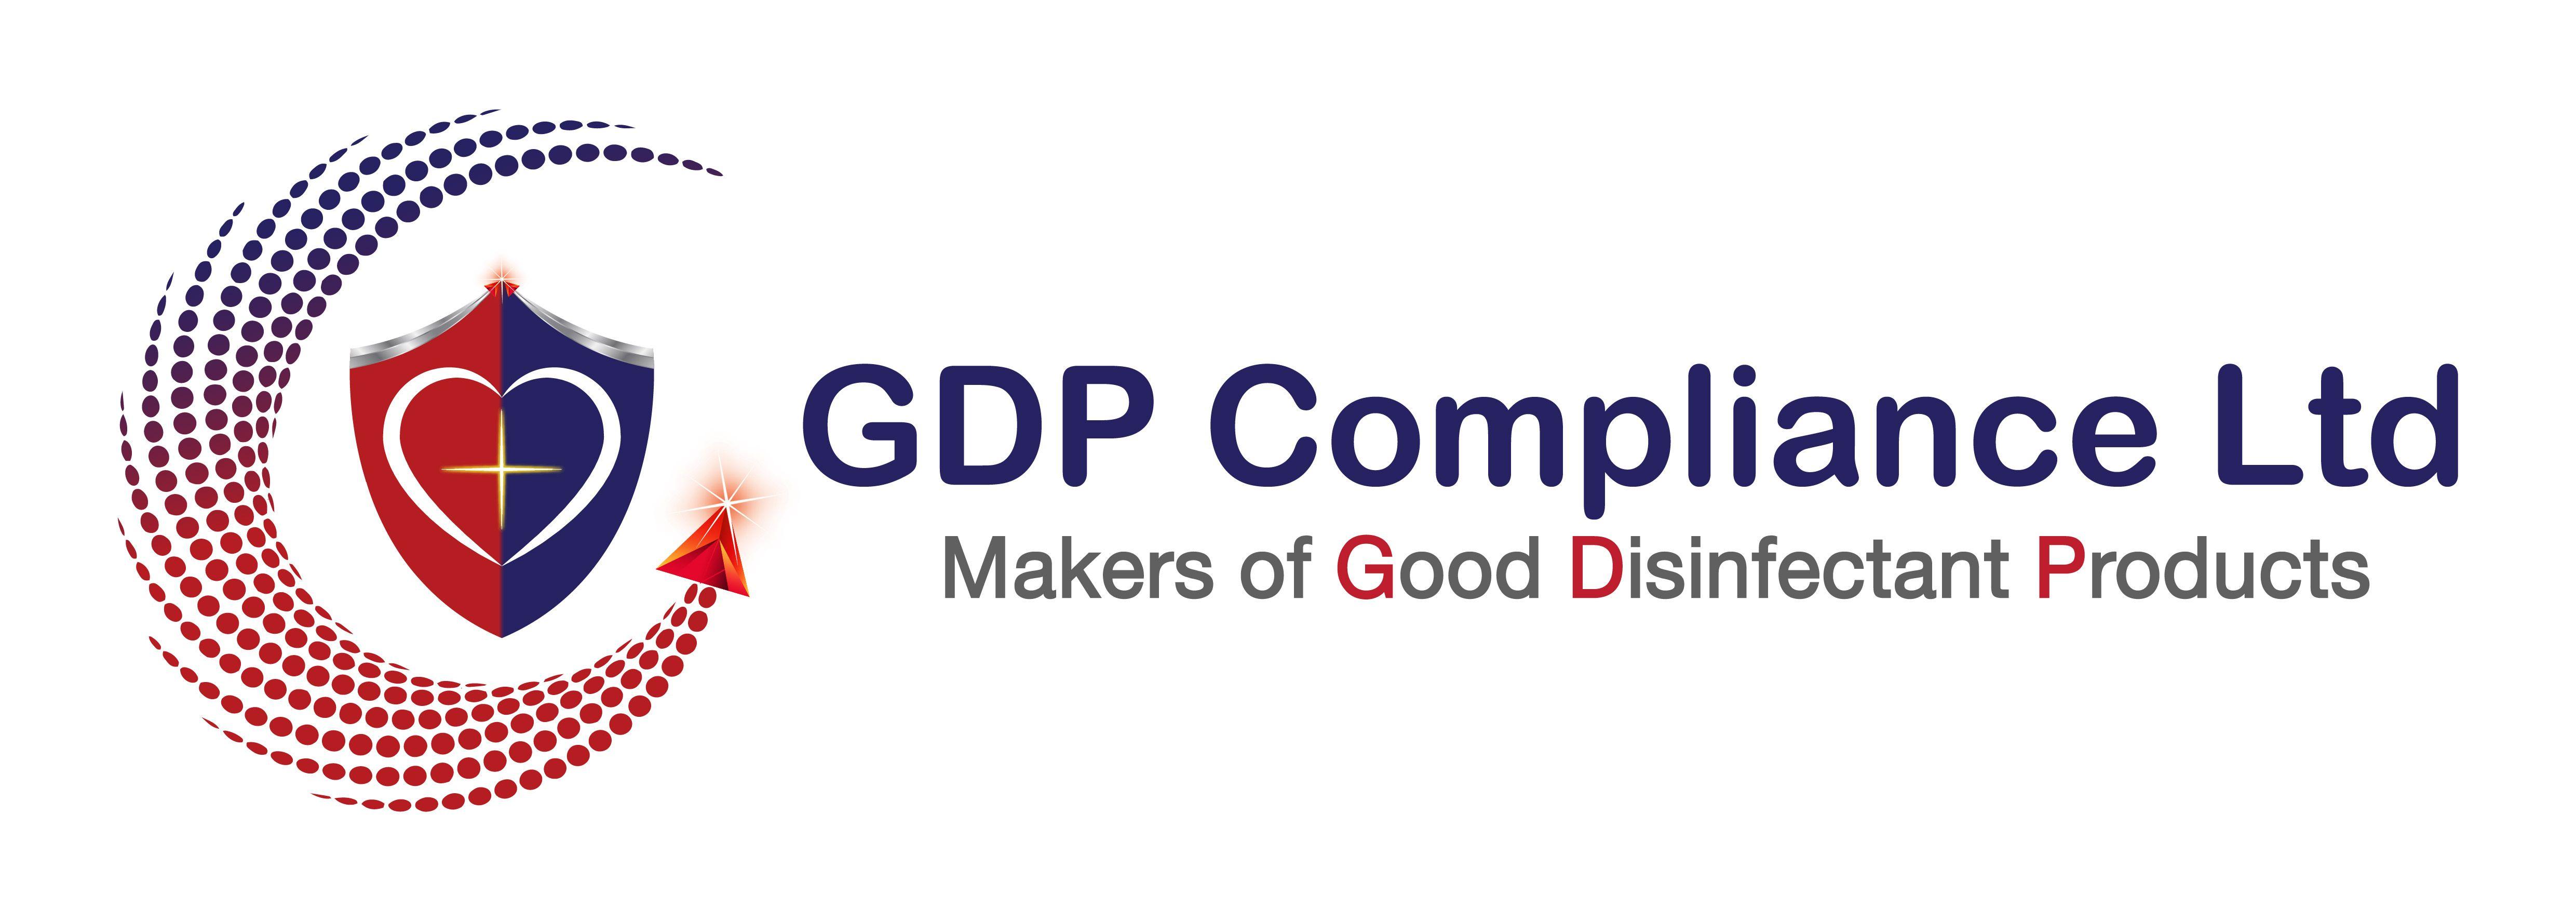 GDP Compliance Ltd